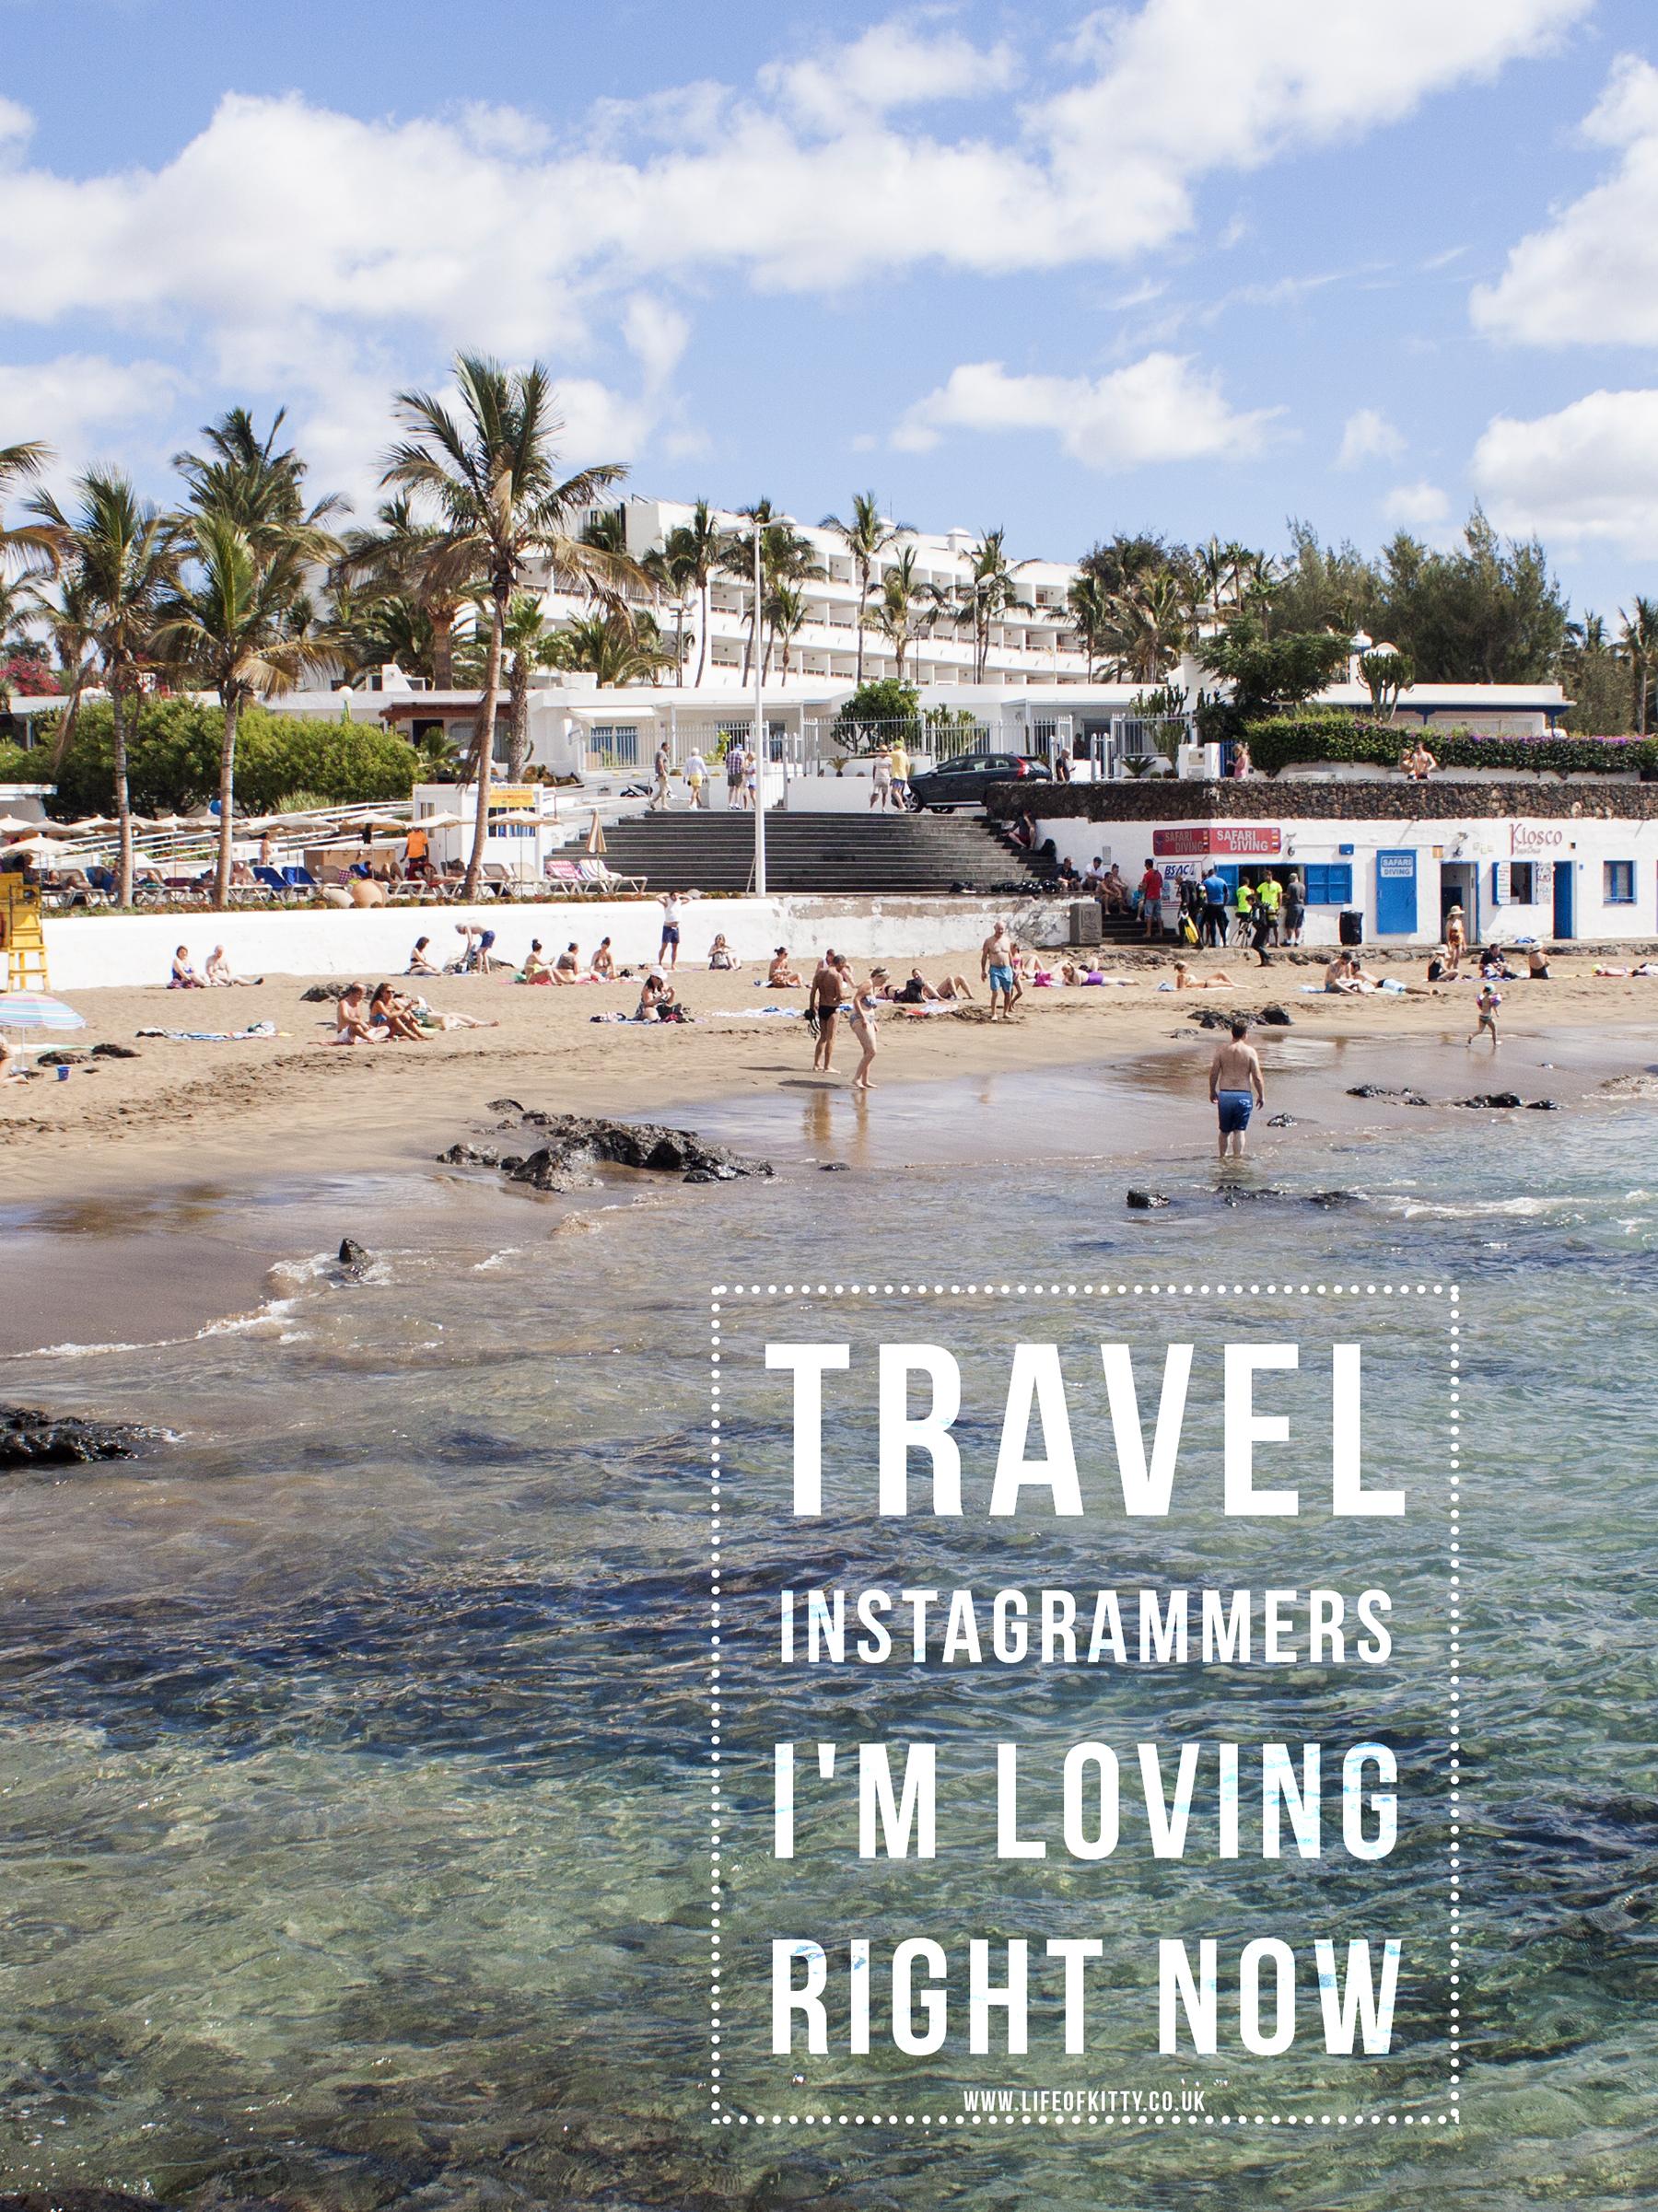 TravelInstagrammers